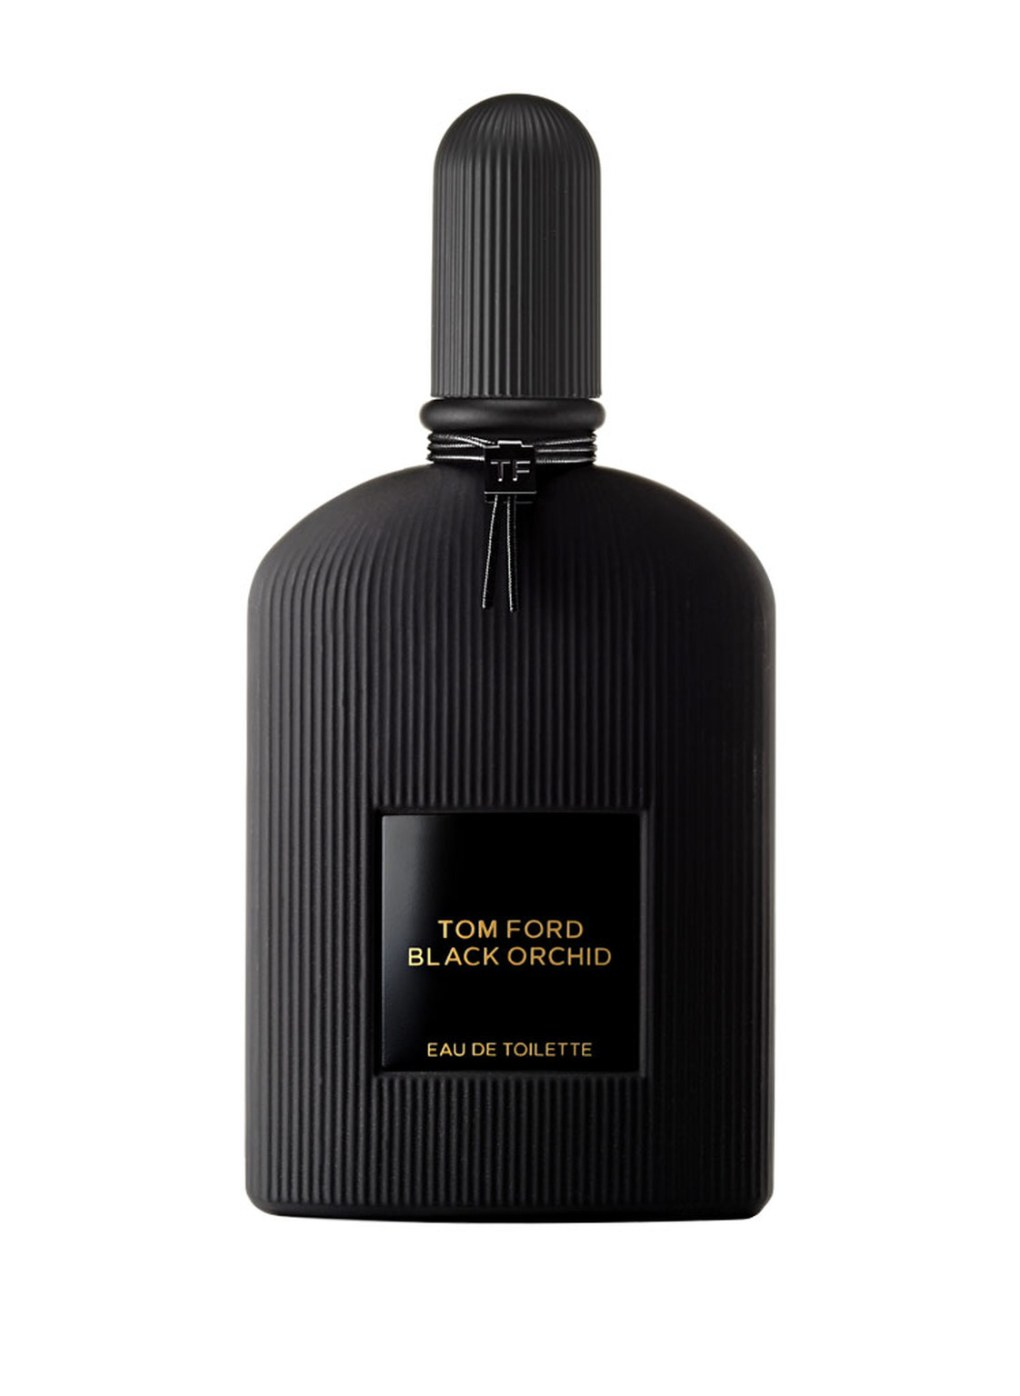 Parfum das lange hält